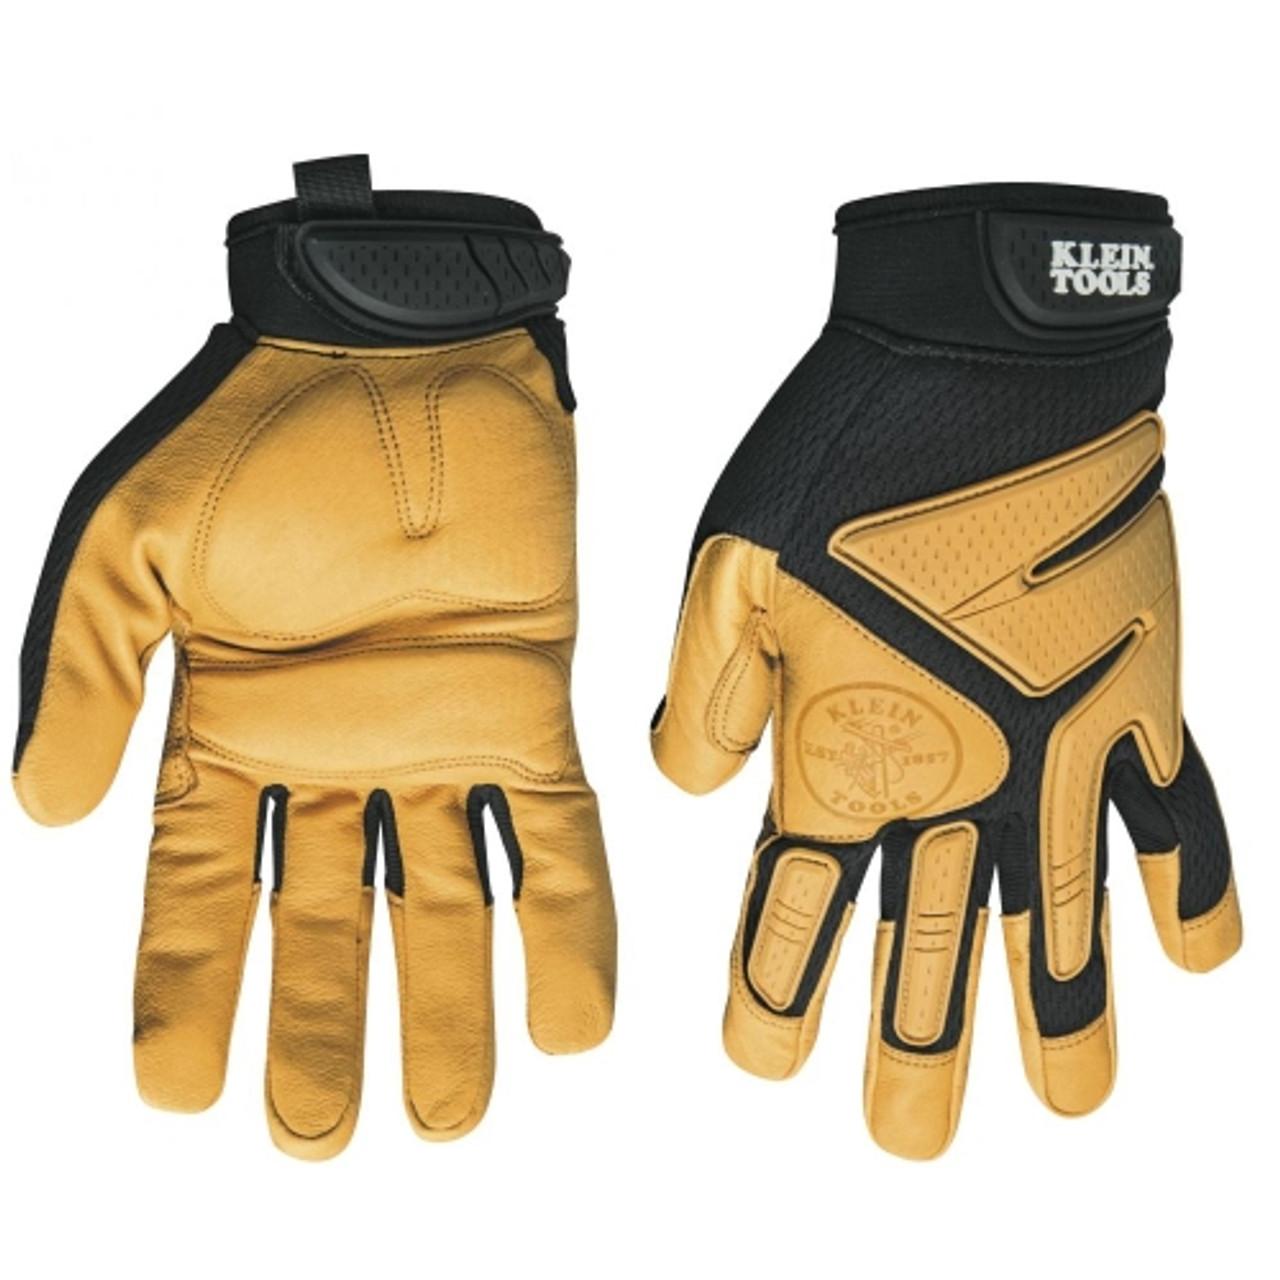 Klein 40221 Journeyman Leather Gloves, Large